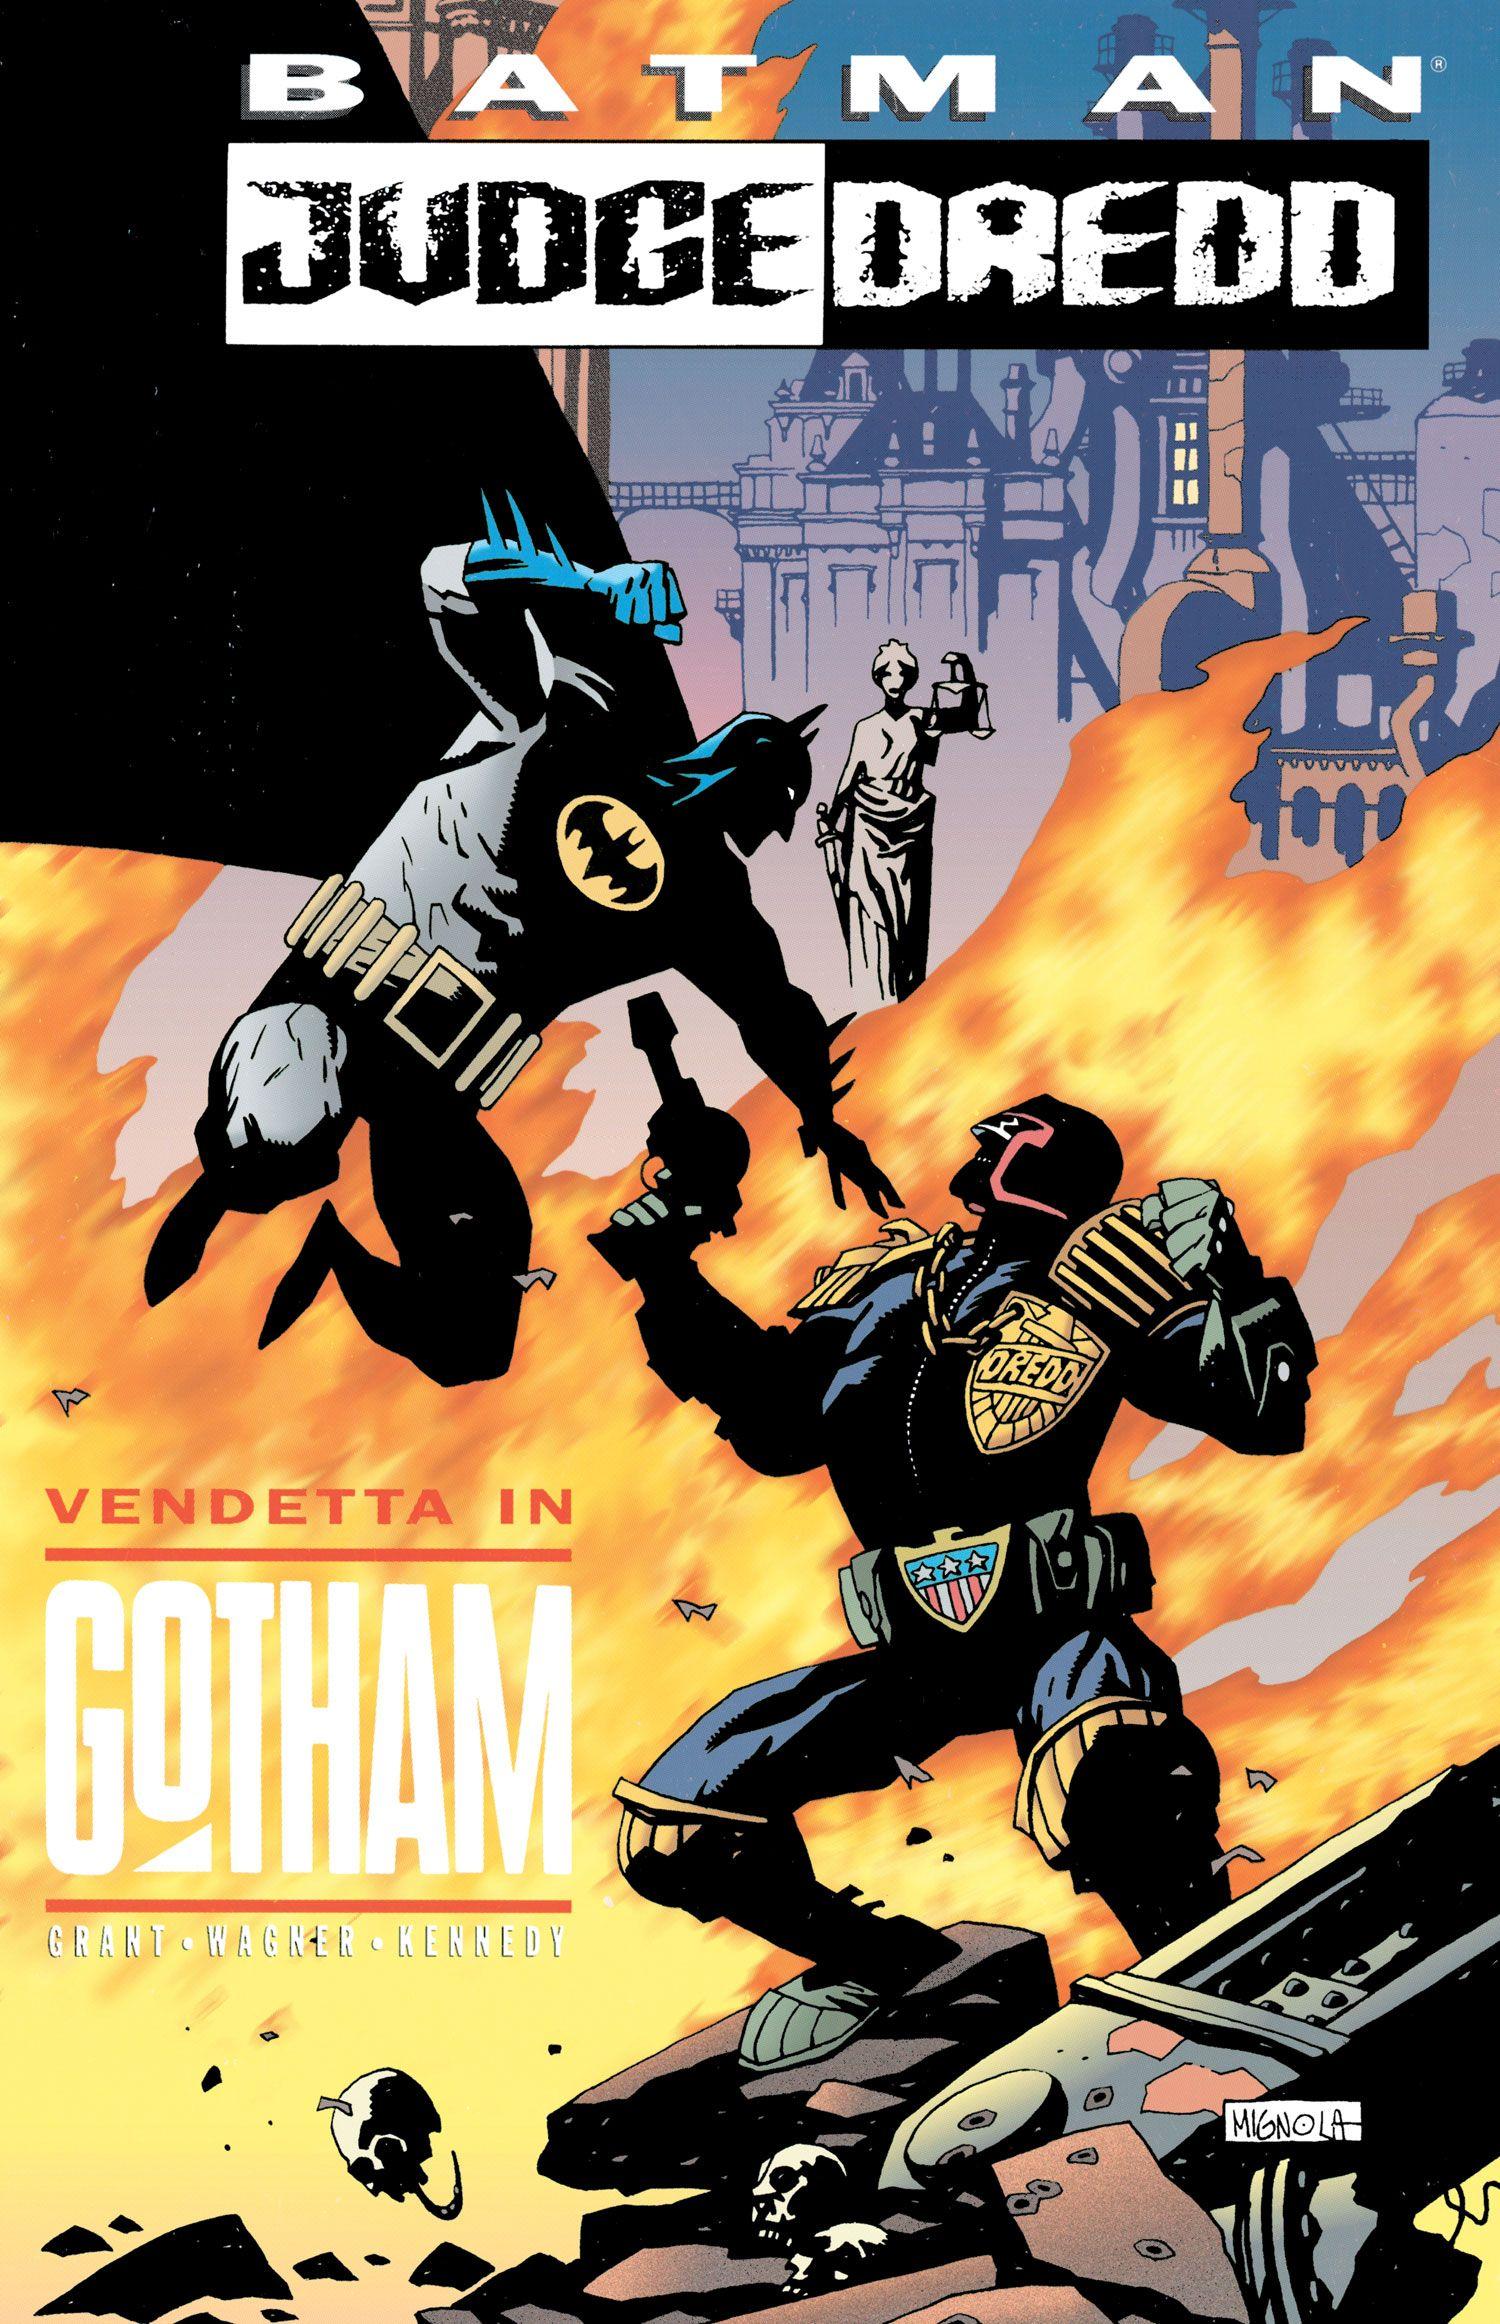 Judge Dredd Comic | Batman vs. Judge Dredd by Mike Mignola | Comic Book Characters